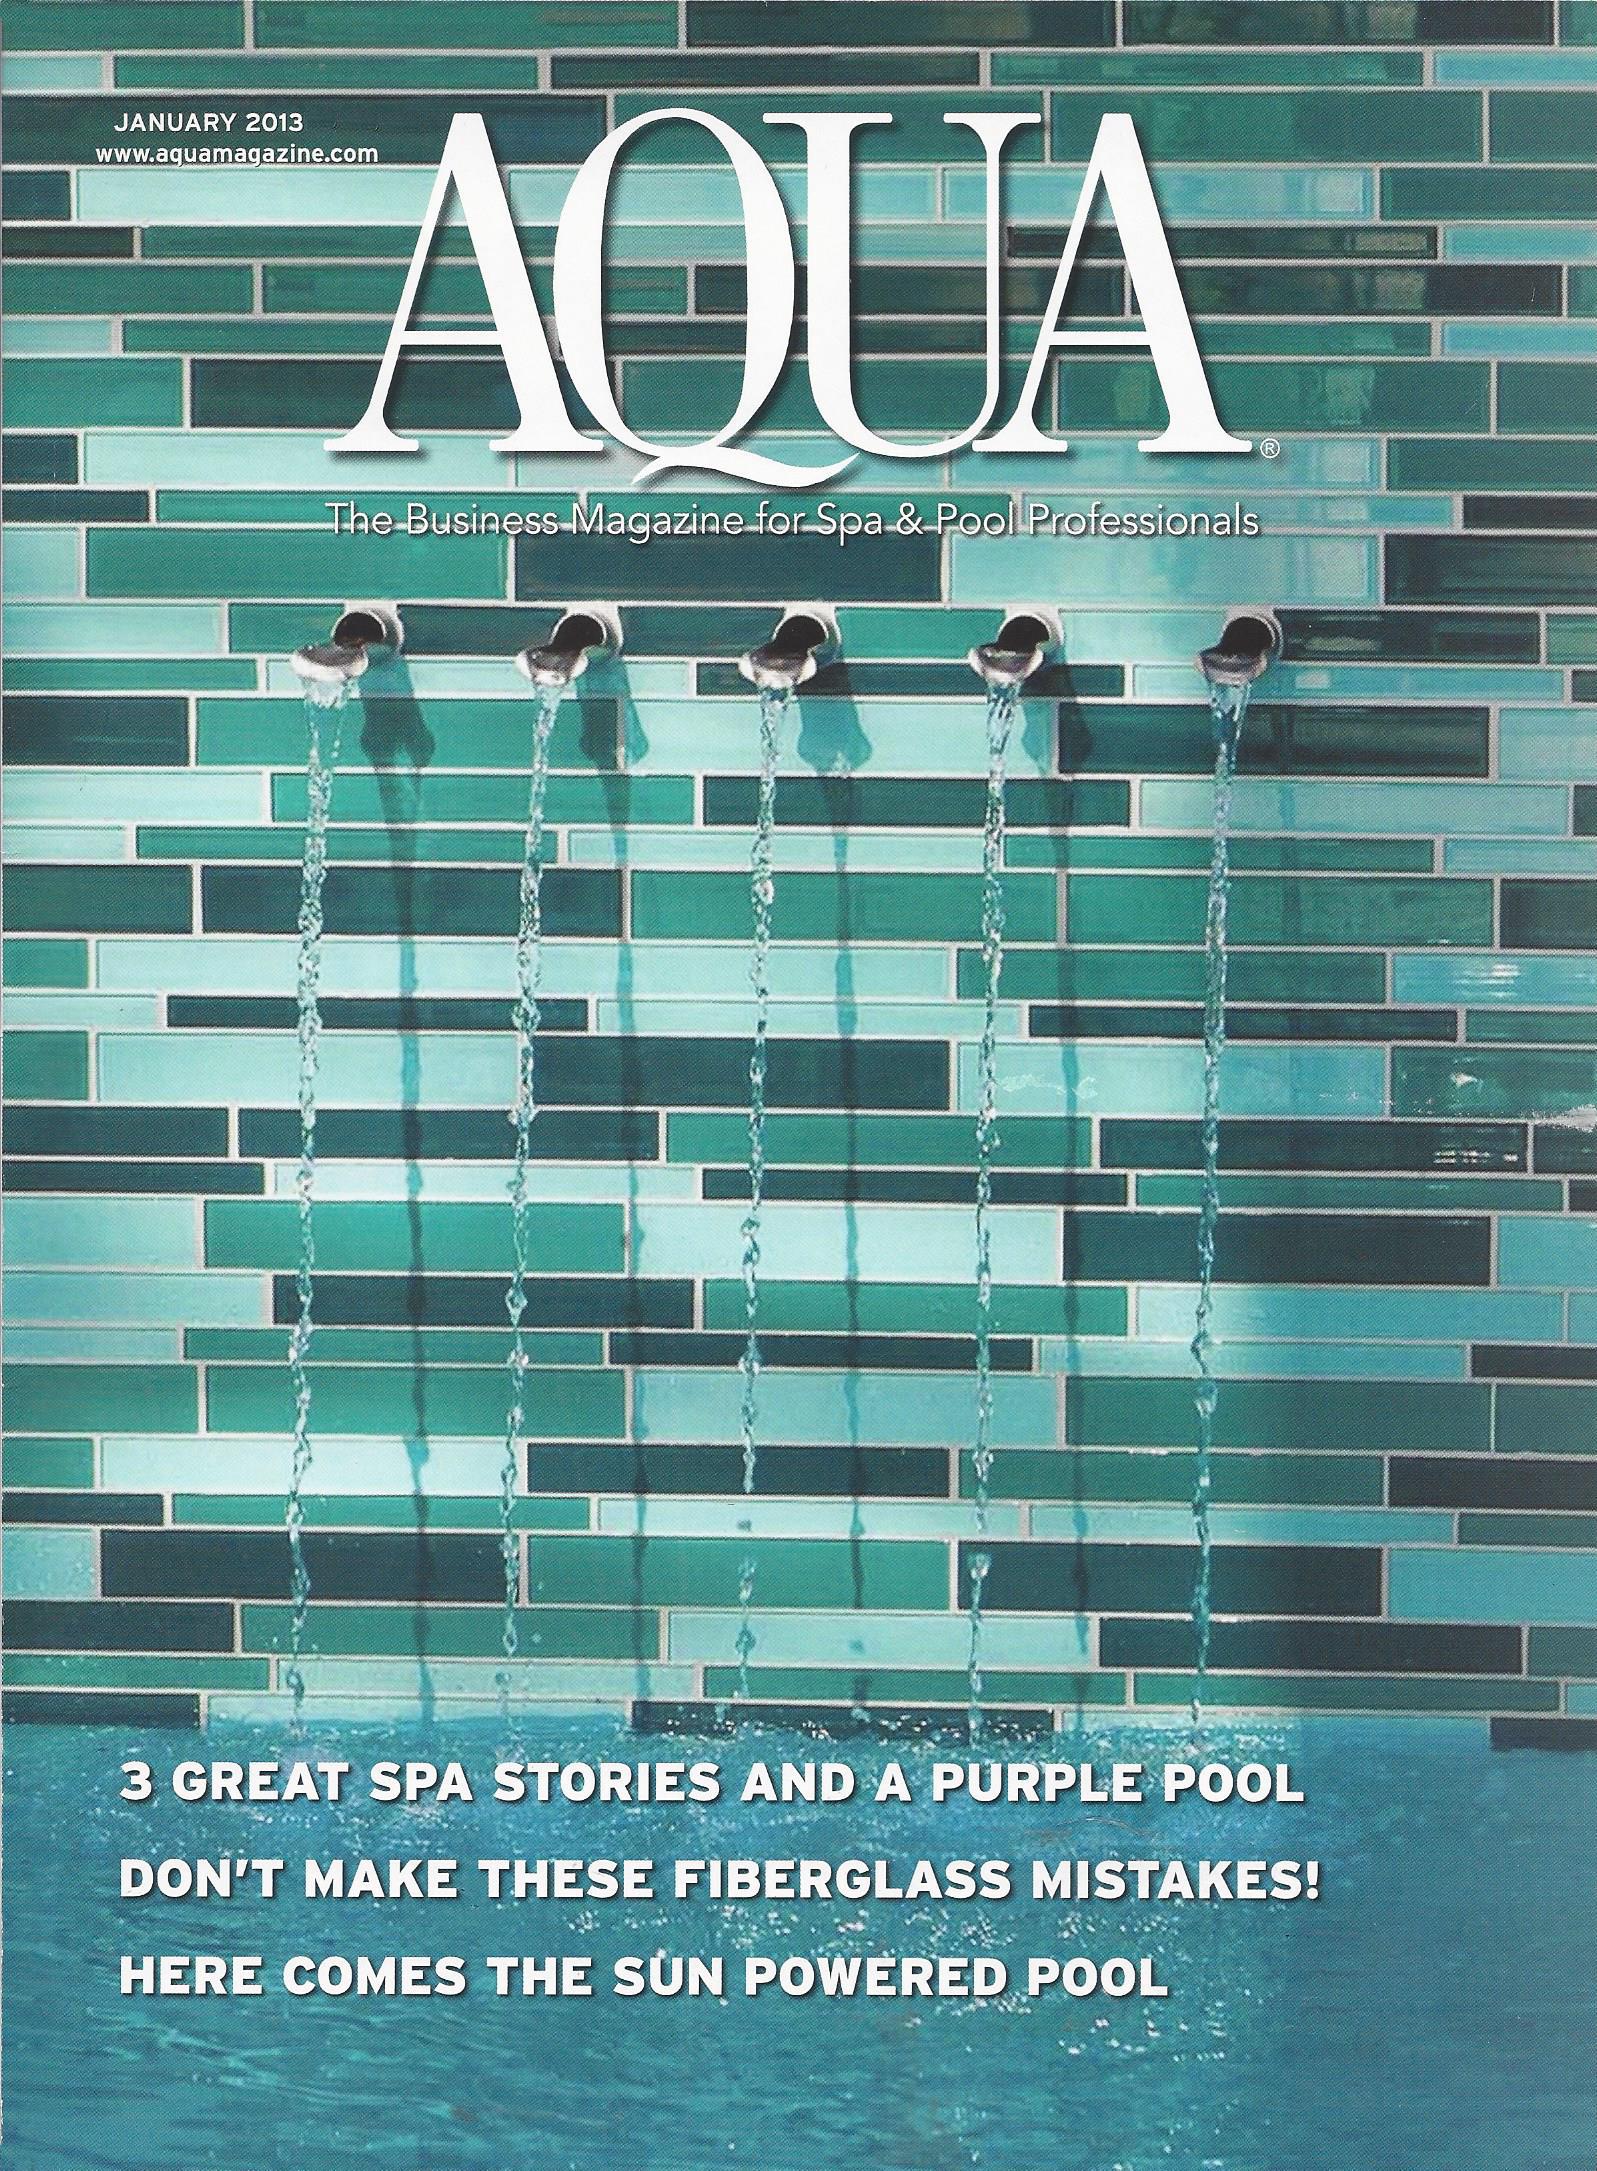 Aqua-Magazine-Jan-2013-cover.jpg